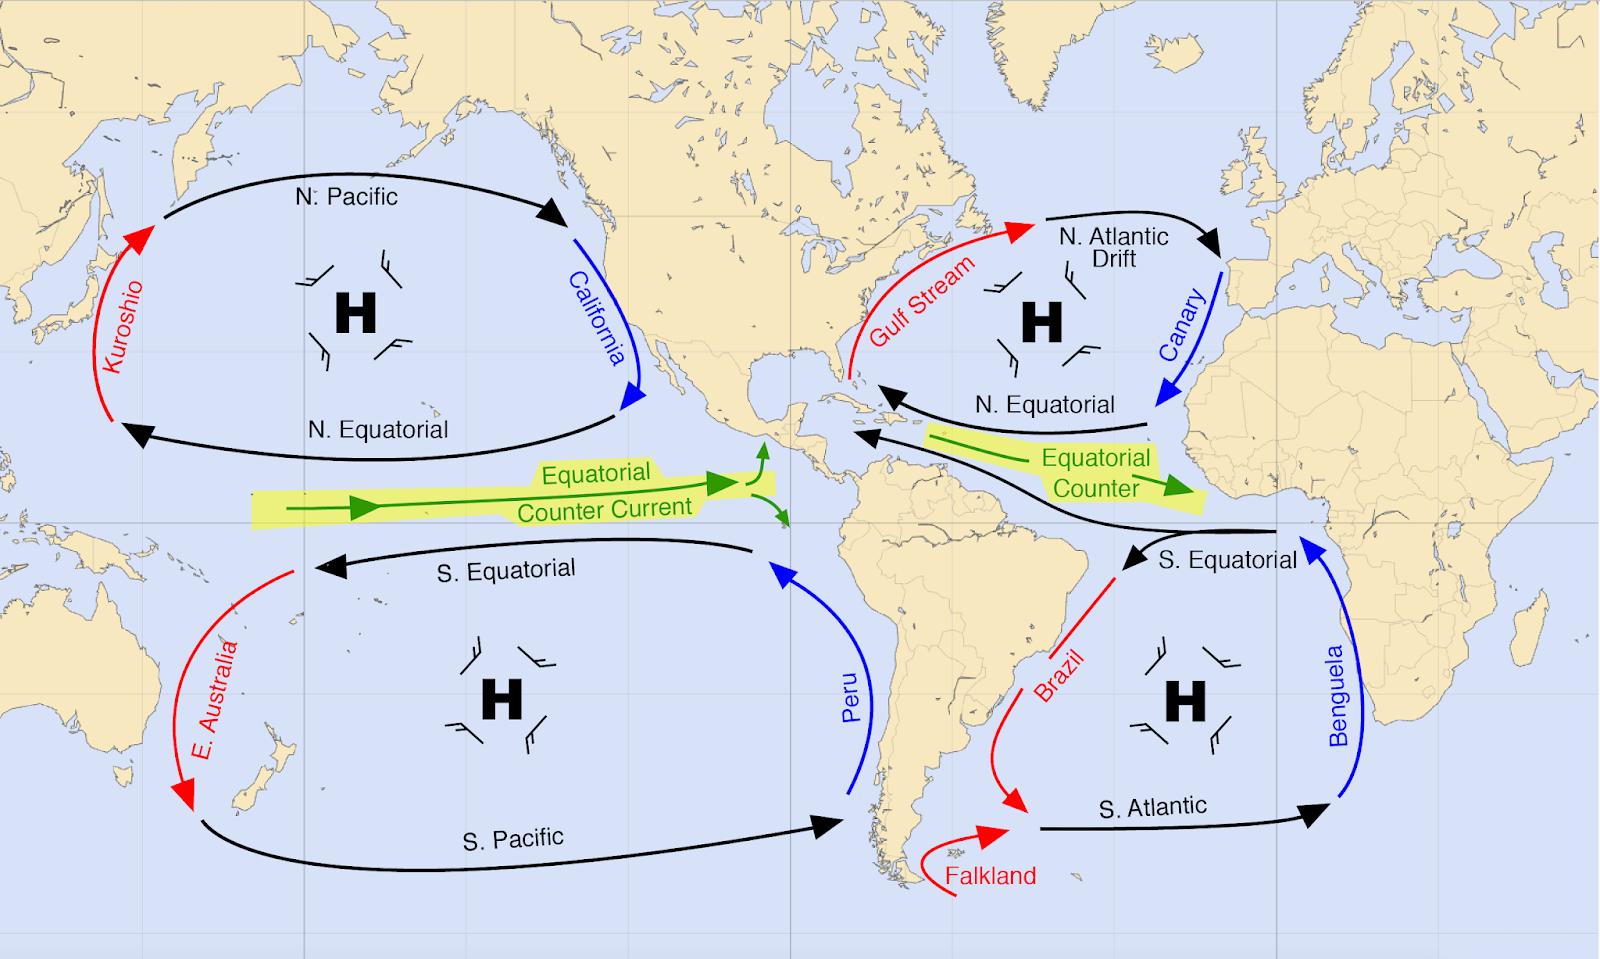 David Burch Navigation Blog Equatorial Countercurrents